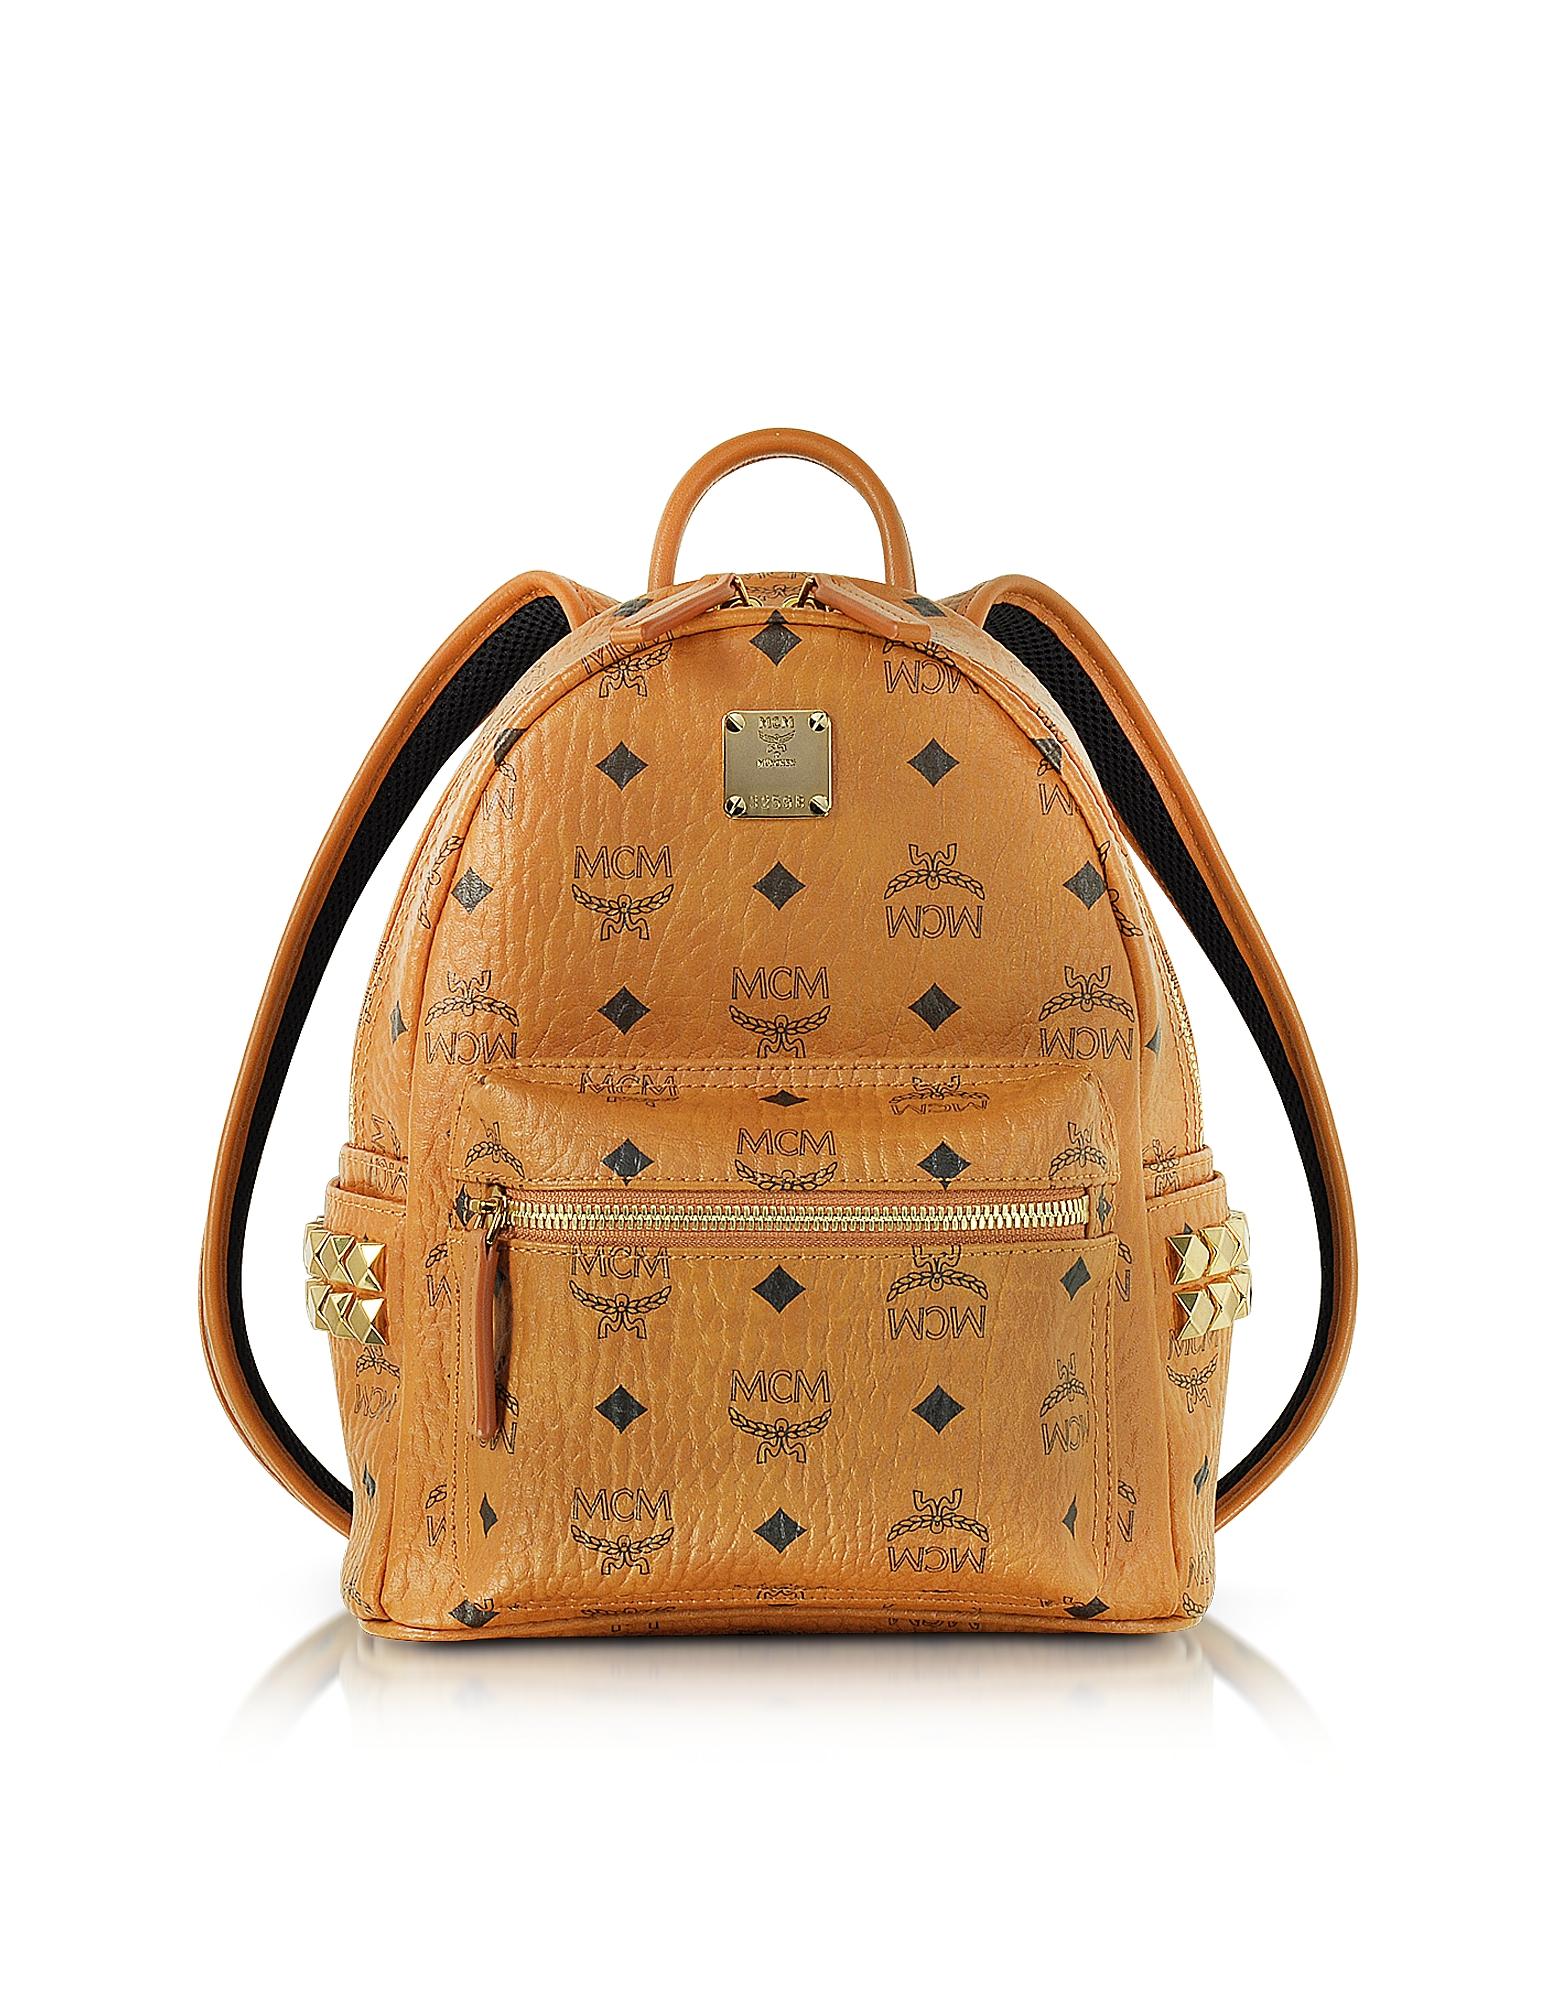 MCM Handbags, Cognac Mini Stark Backpack